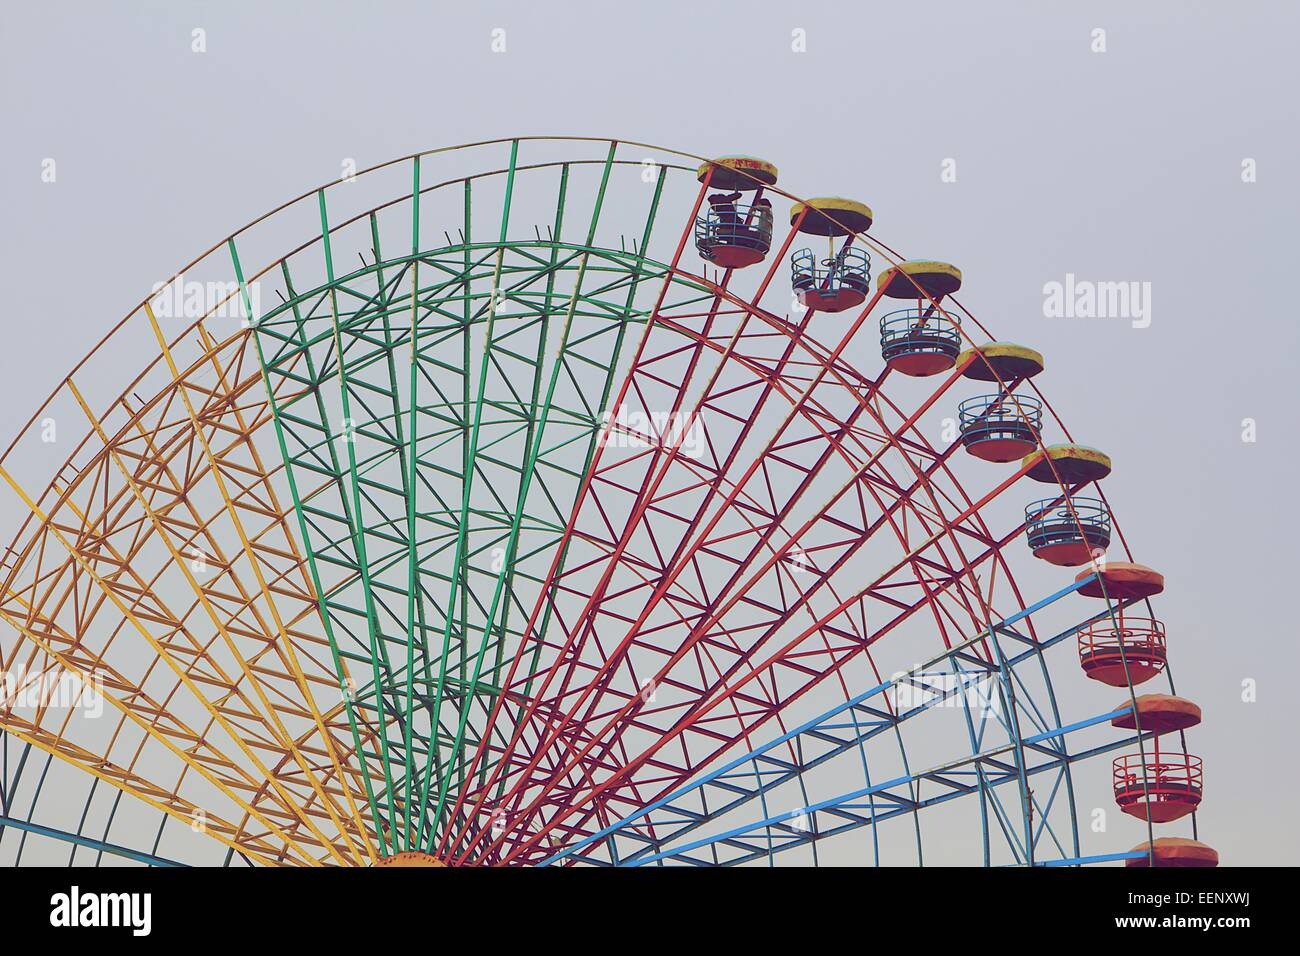 Ferries wheel à Beyrouth. Photo Stock